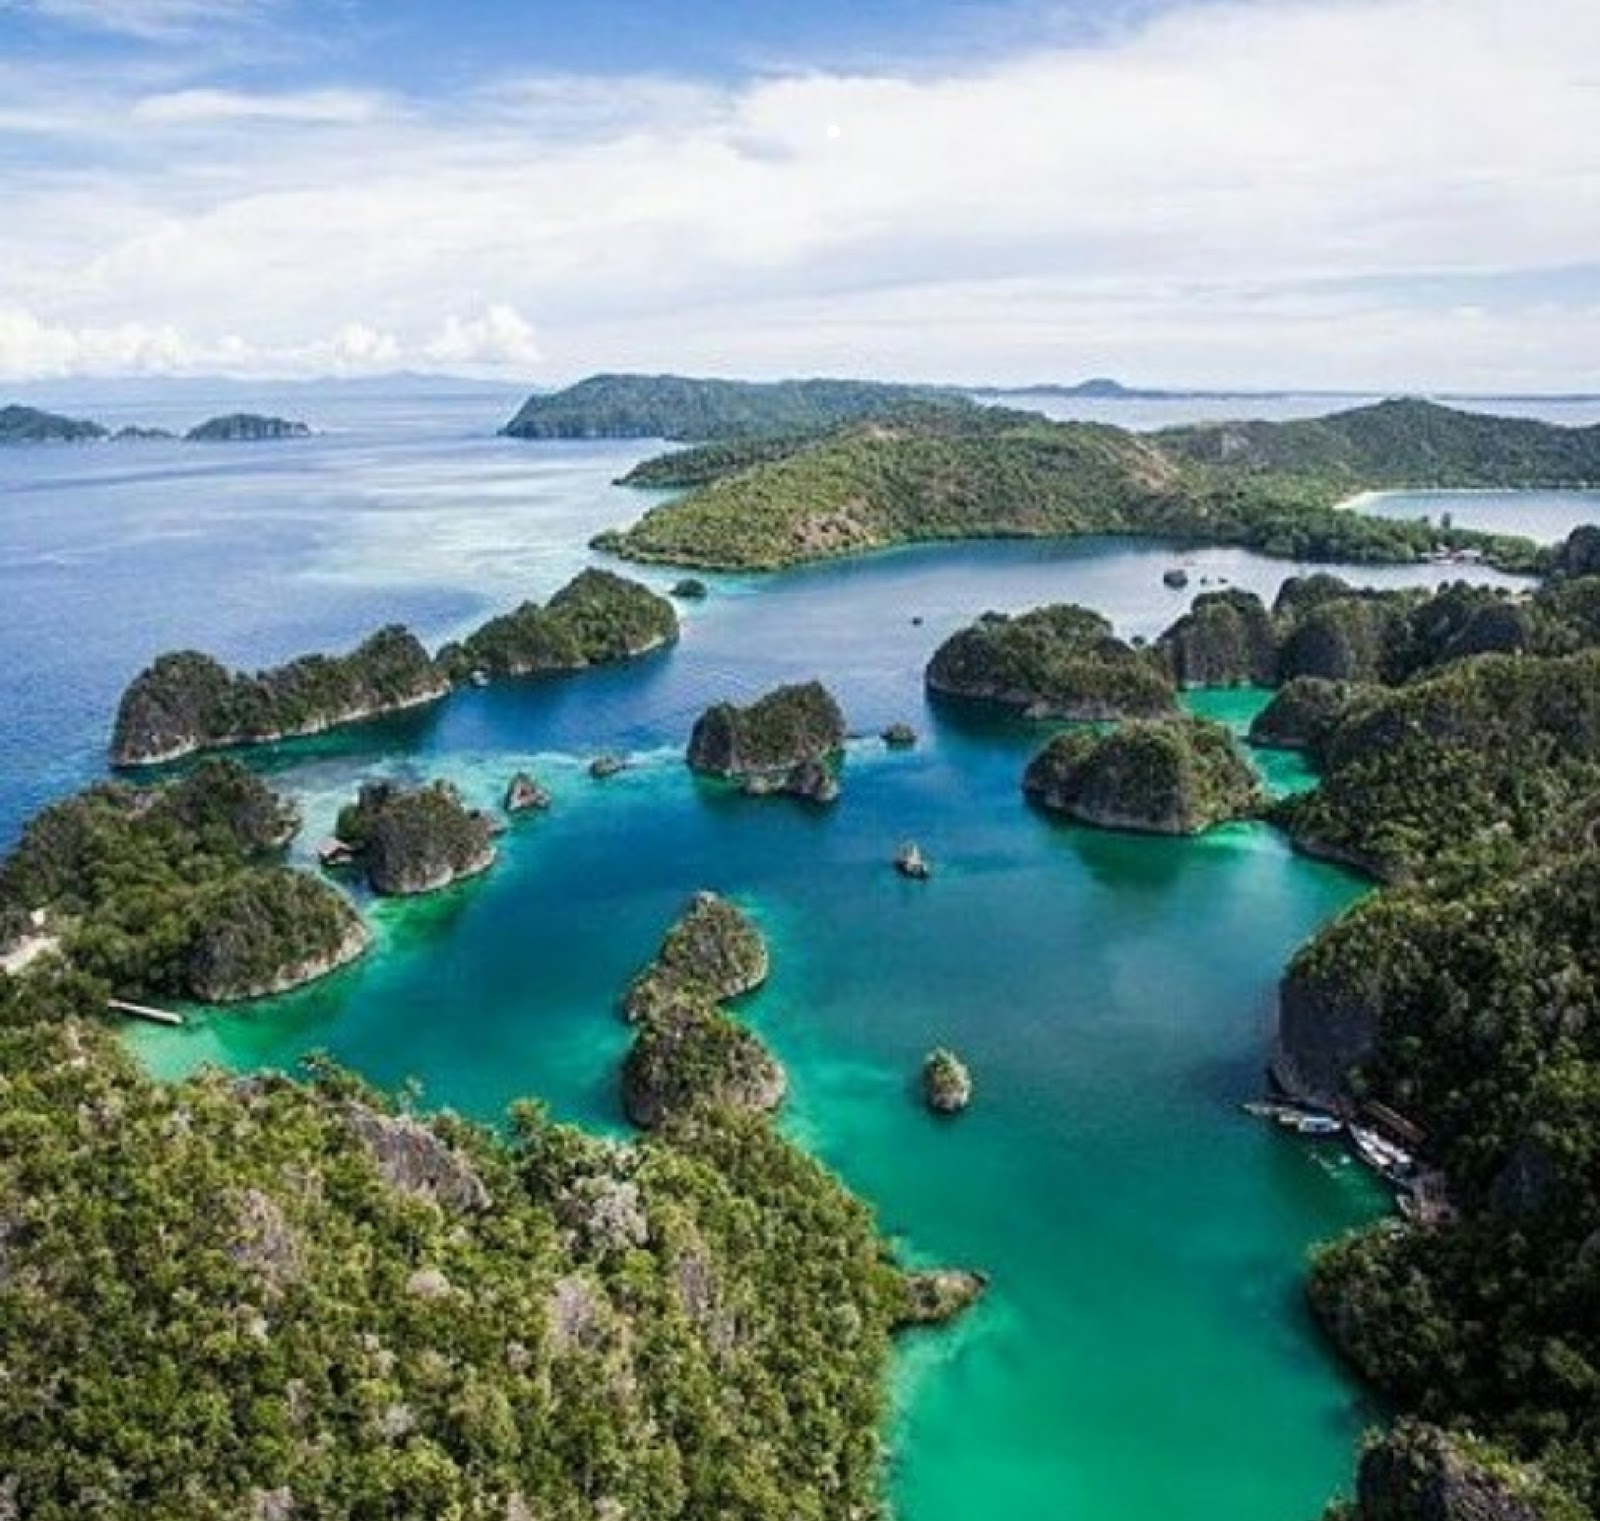 Gambar Raja Ampat Papua, Sejarah, Lokasi Alamat + Hotel Terdekat